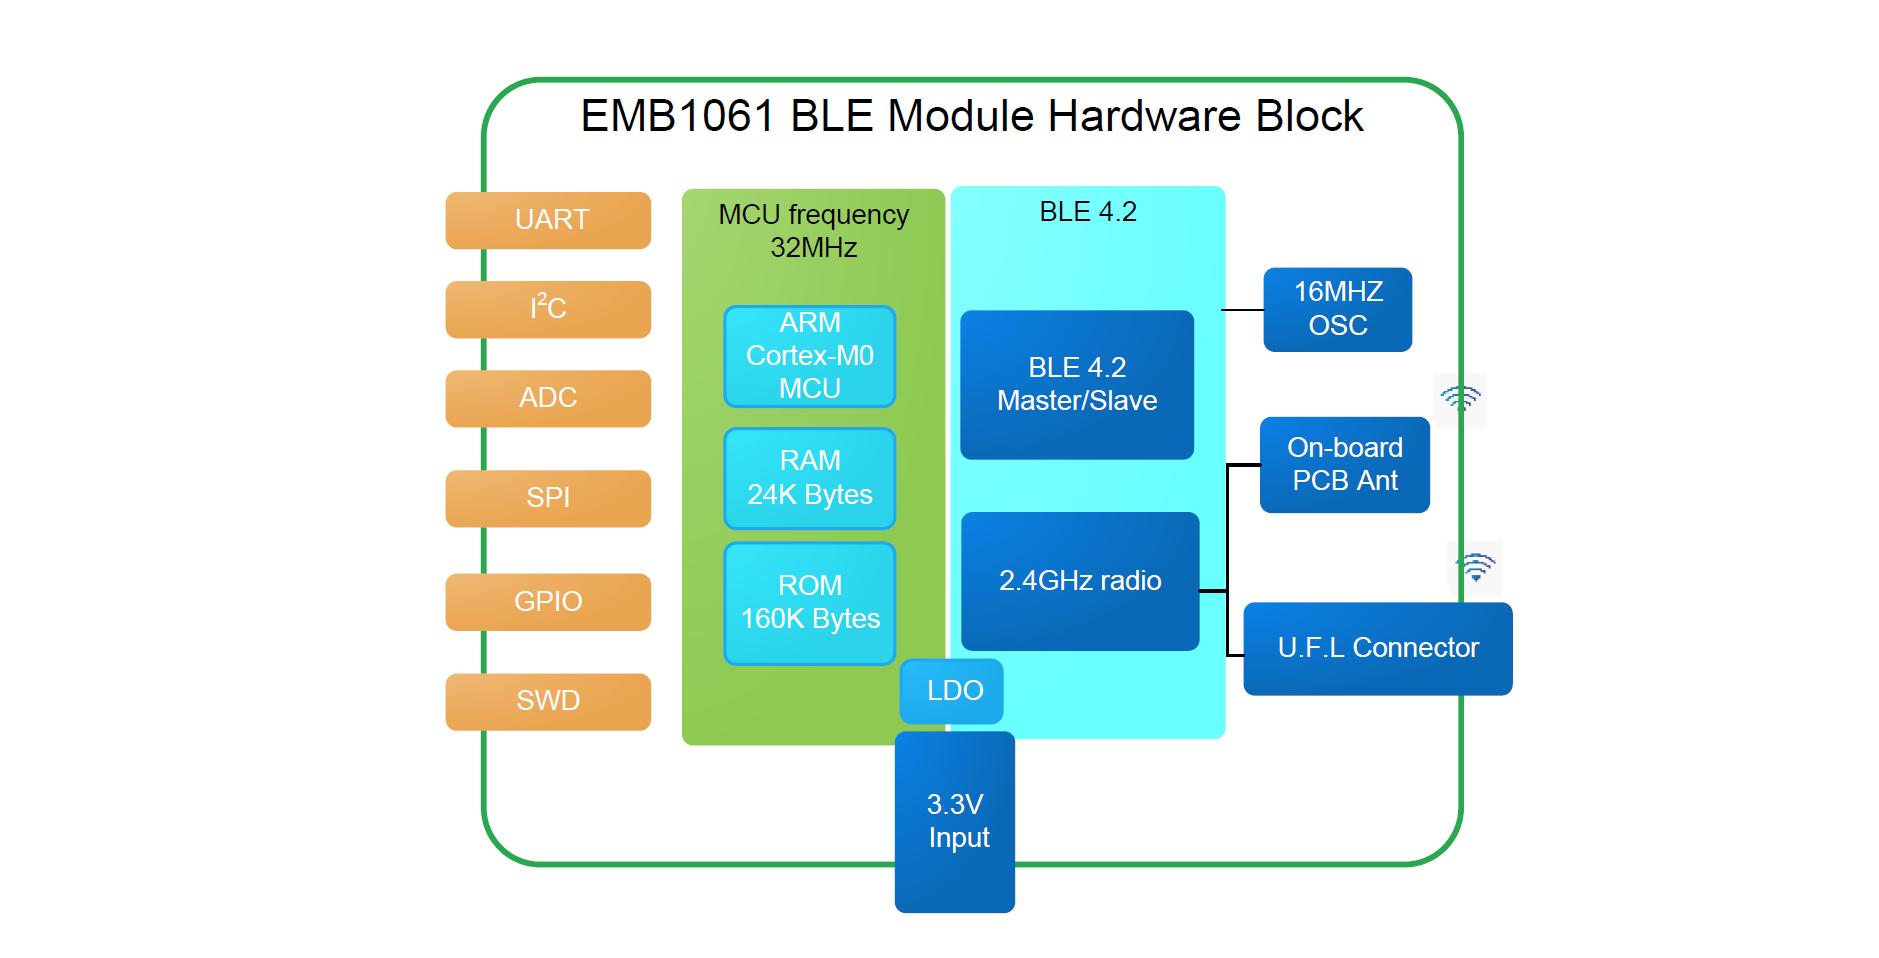 EMB1061 Block